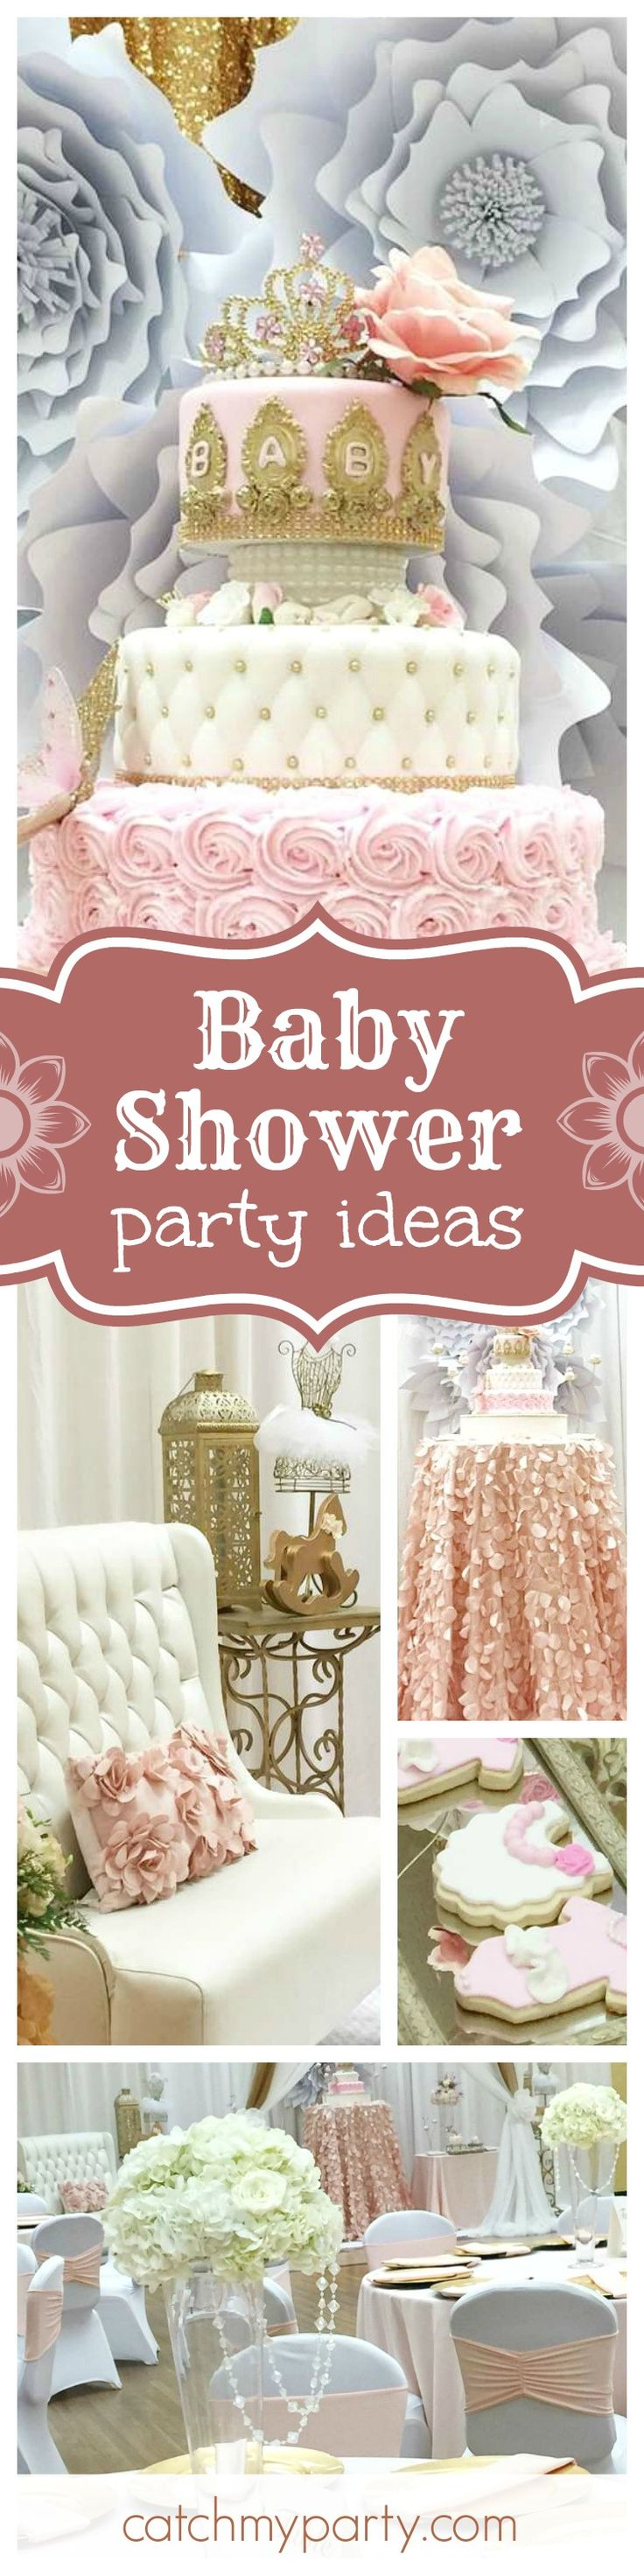 585 best Baby shower ideas images on Pinterest